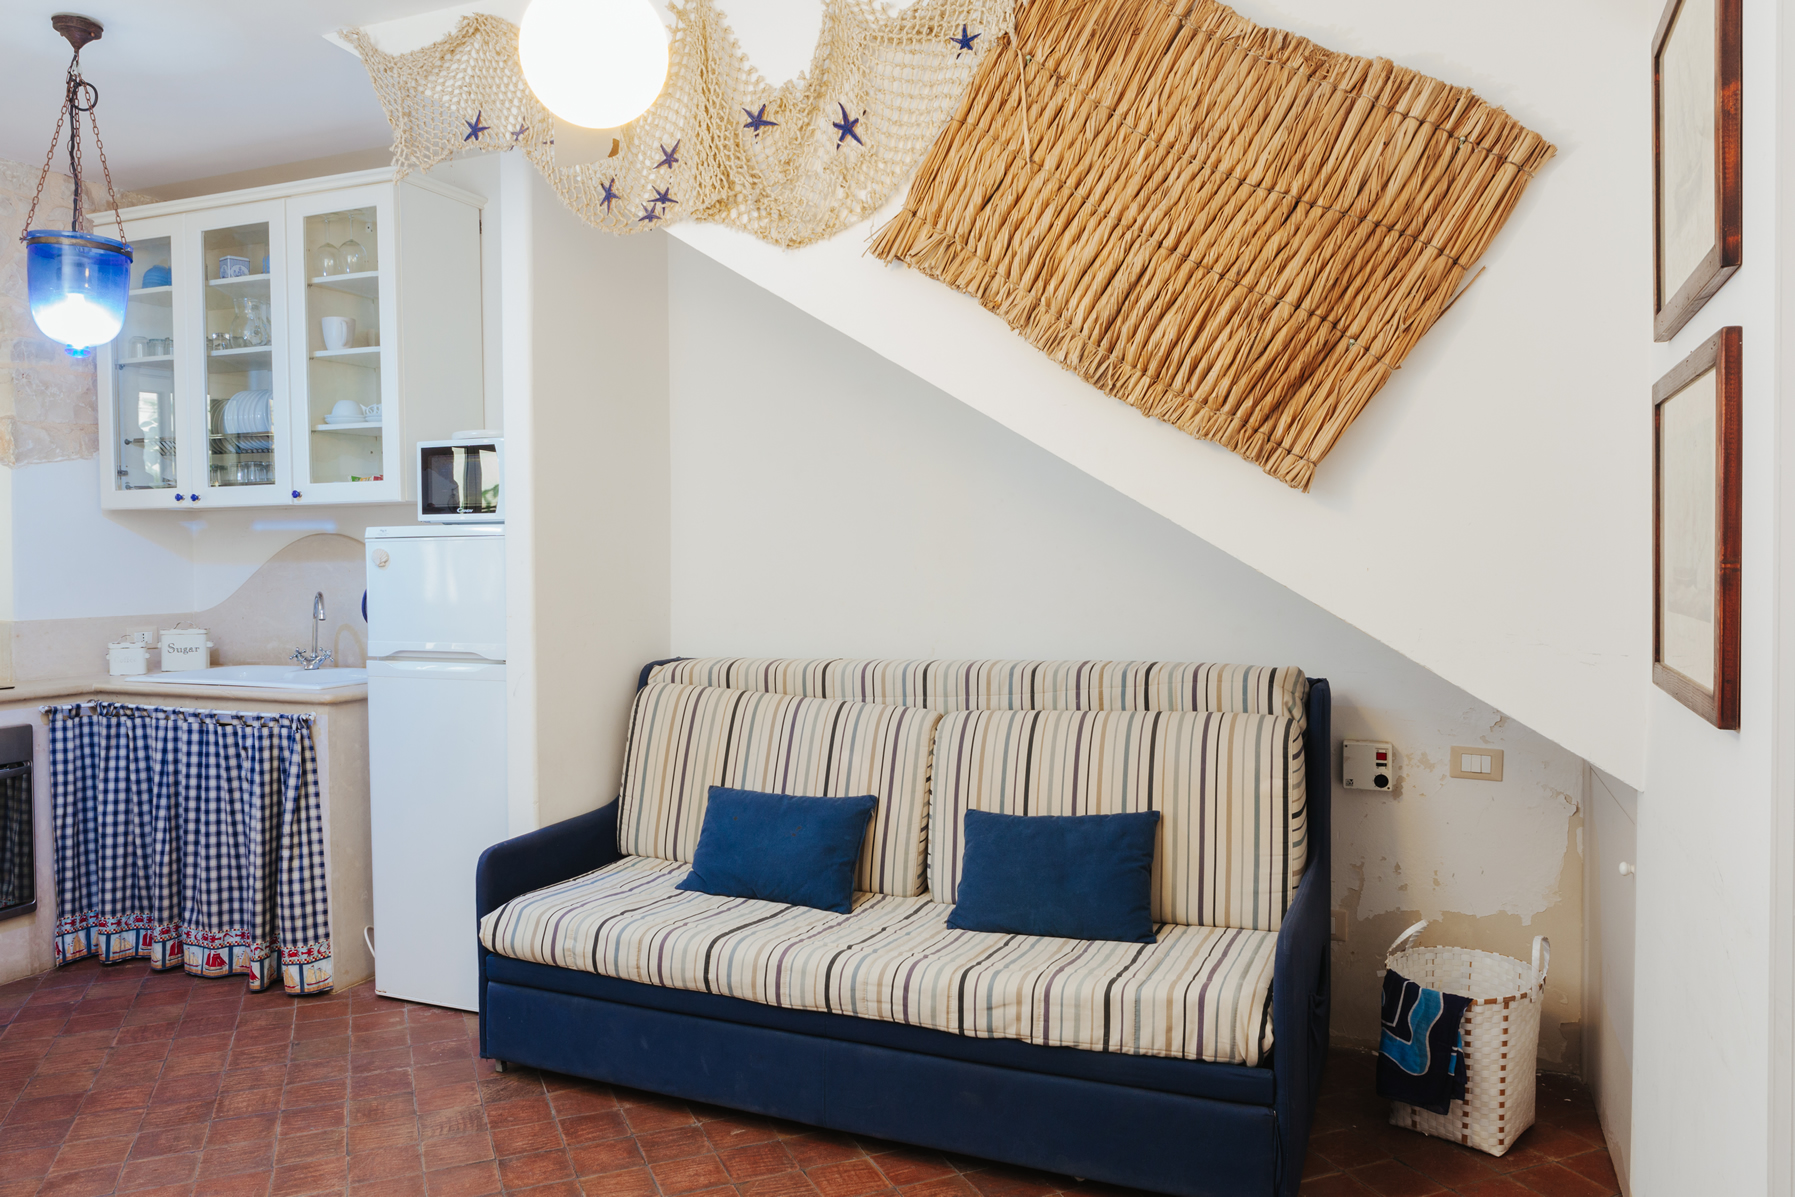 5sampieri-casa-vacanze-sicilia-appartamento-sicily-holiday-apartment-casa-del-pescatore-italia-italy.jpg